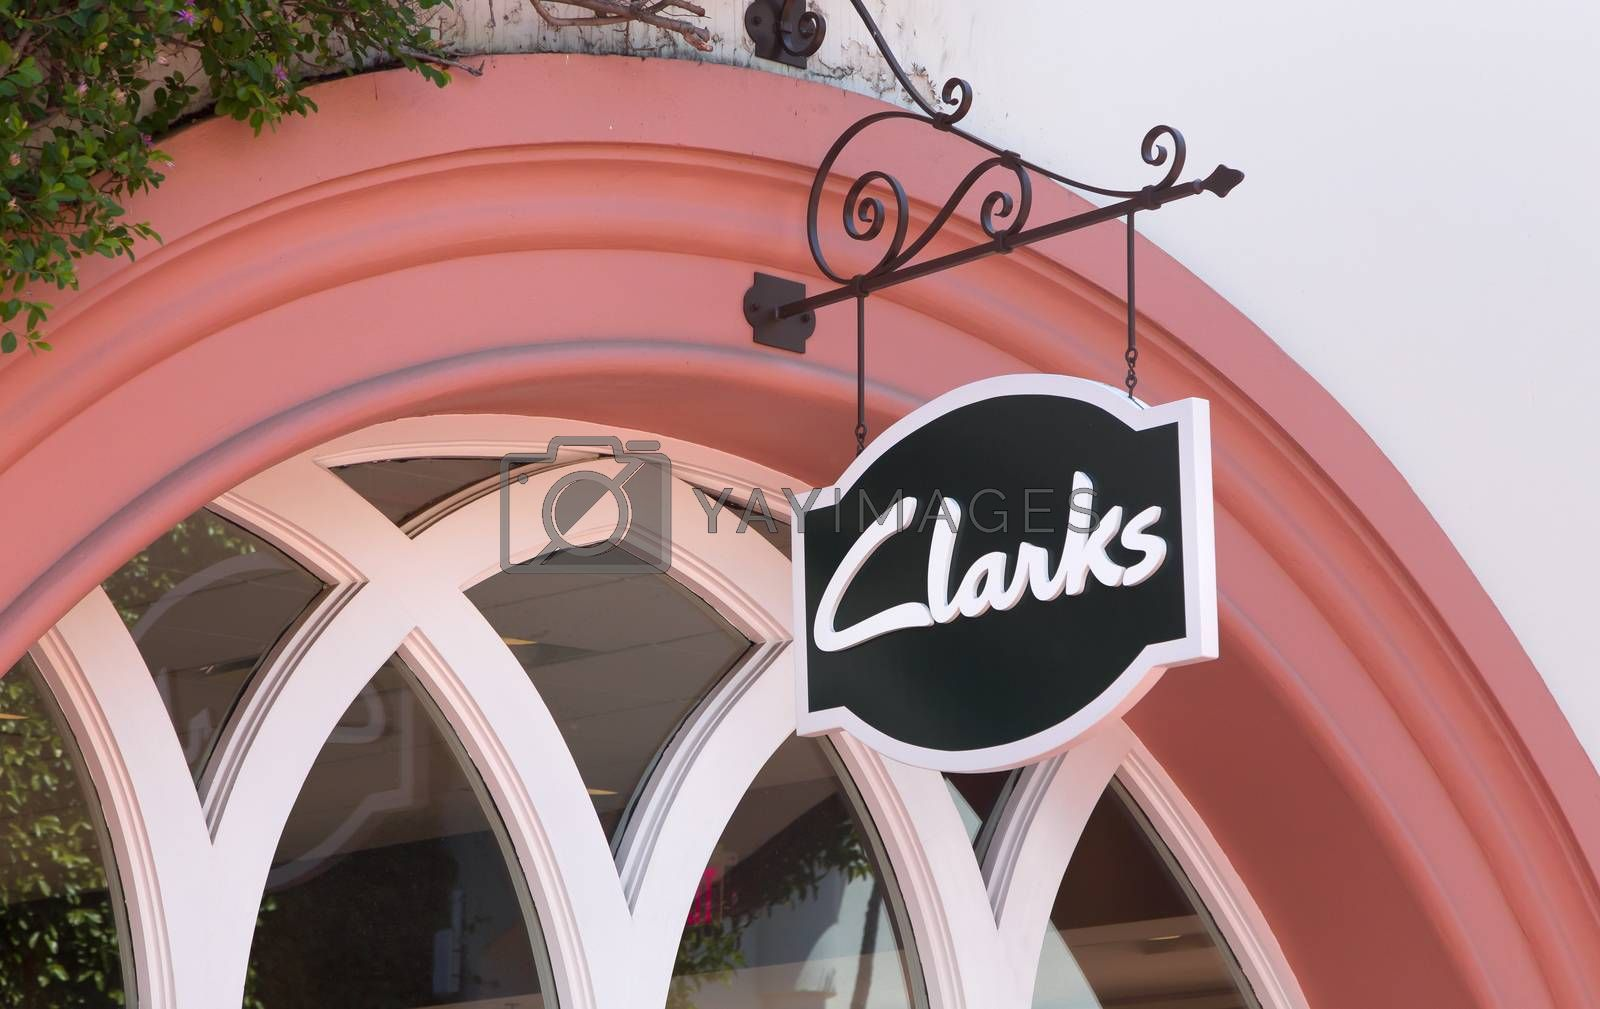 SANTA BARBARA, CA/USA - APRIL 30, 2016: Clarks retail store exterior and sign. C. & J. Clark International Ltd. is a British shoe manufacturer and retailer.